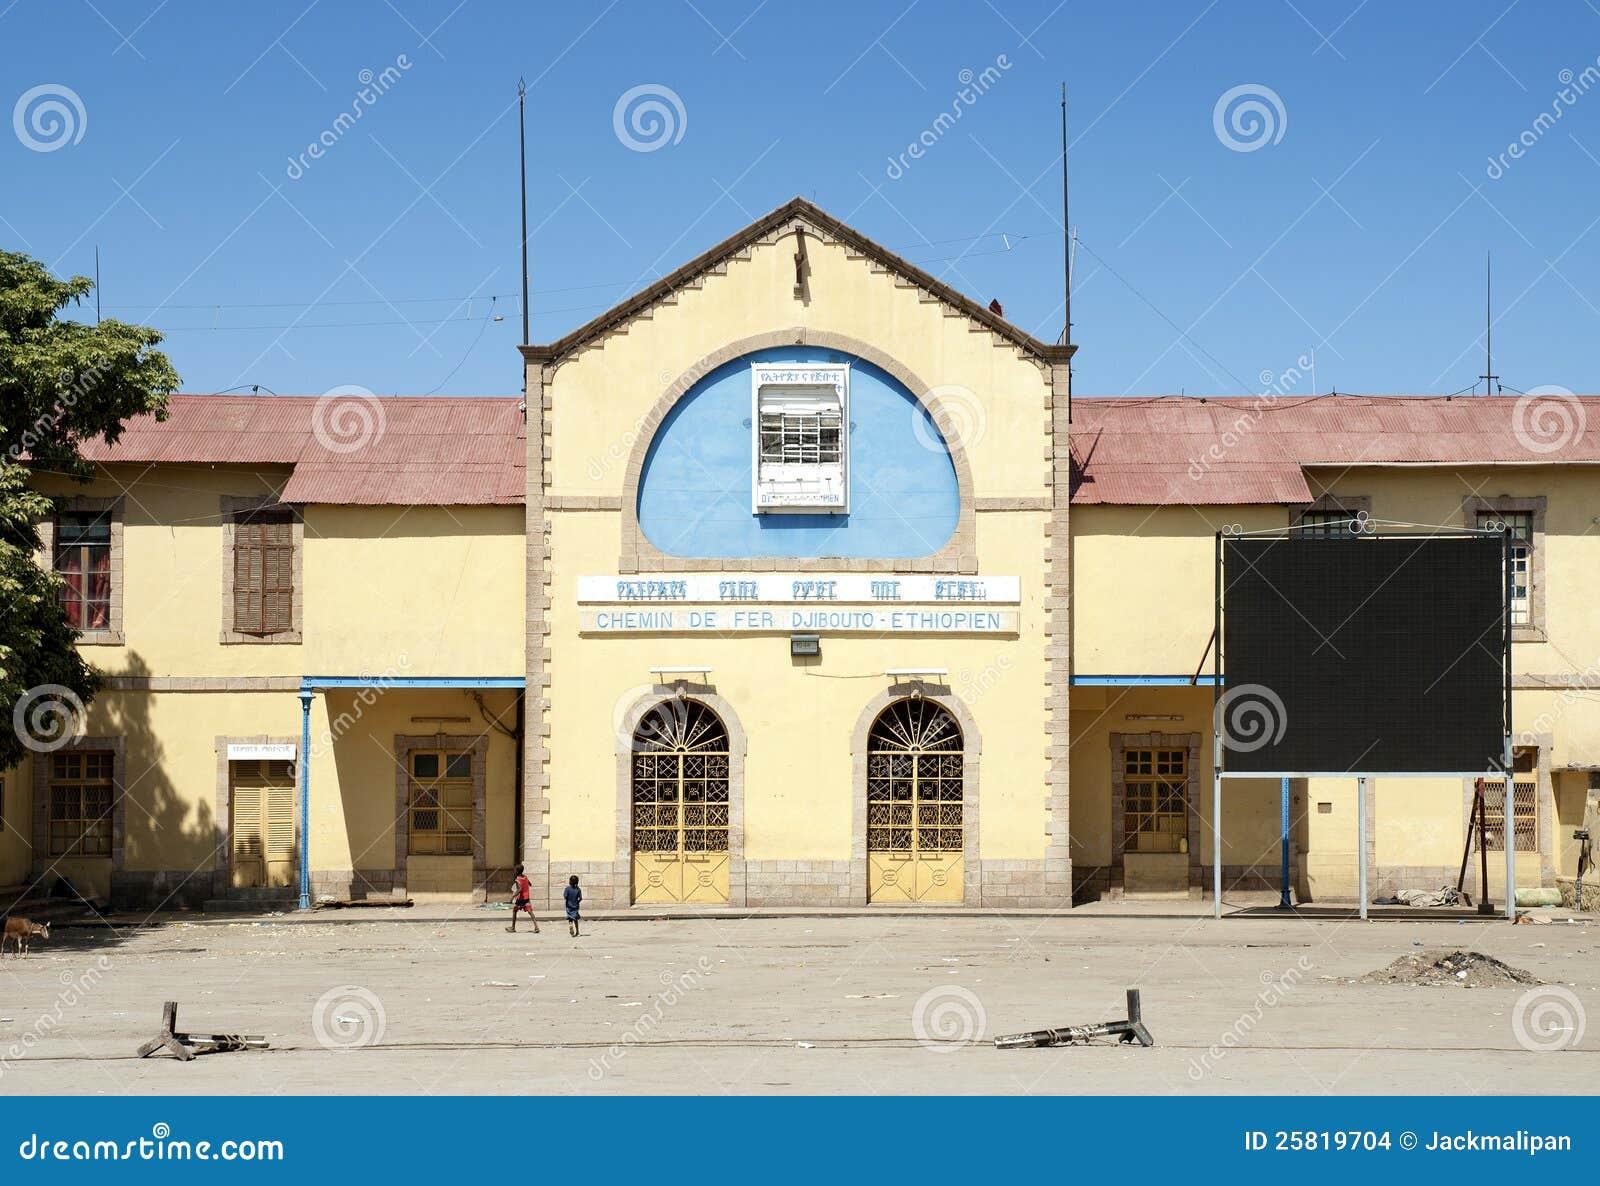 Ethiopia To Djibouti Railway Station In Dire Dawa Ethiopia Editorial